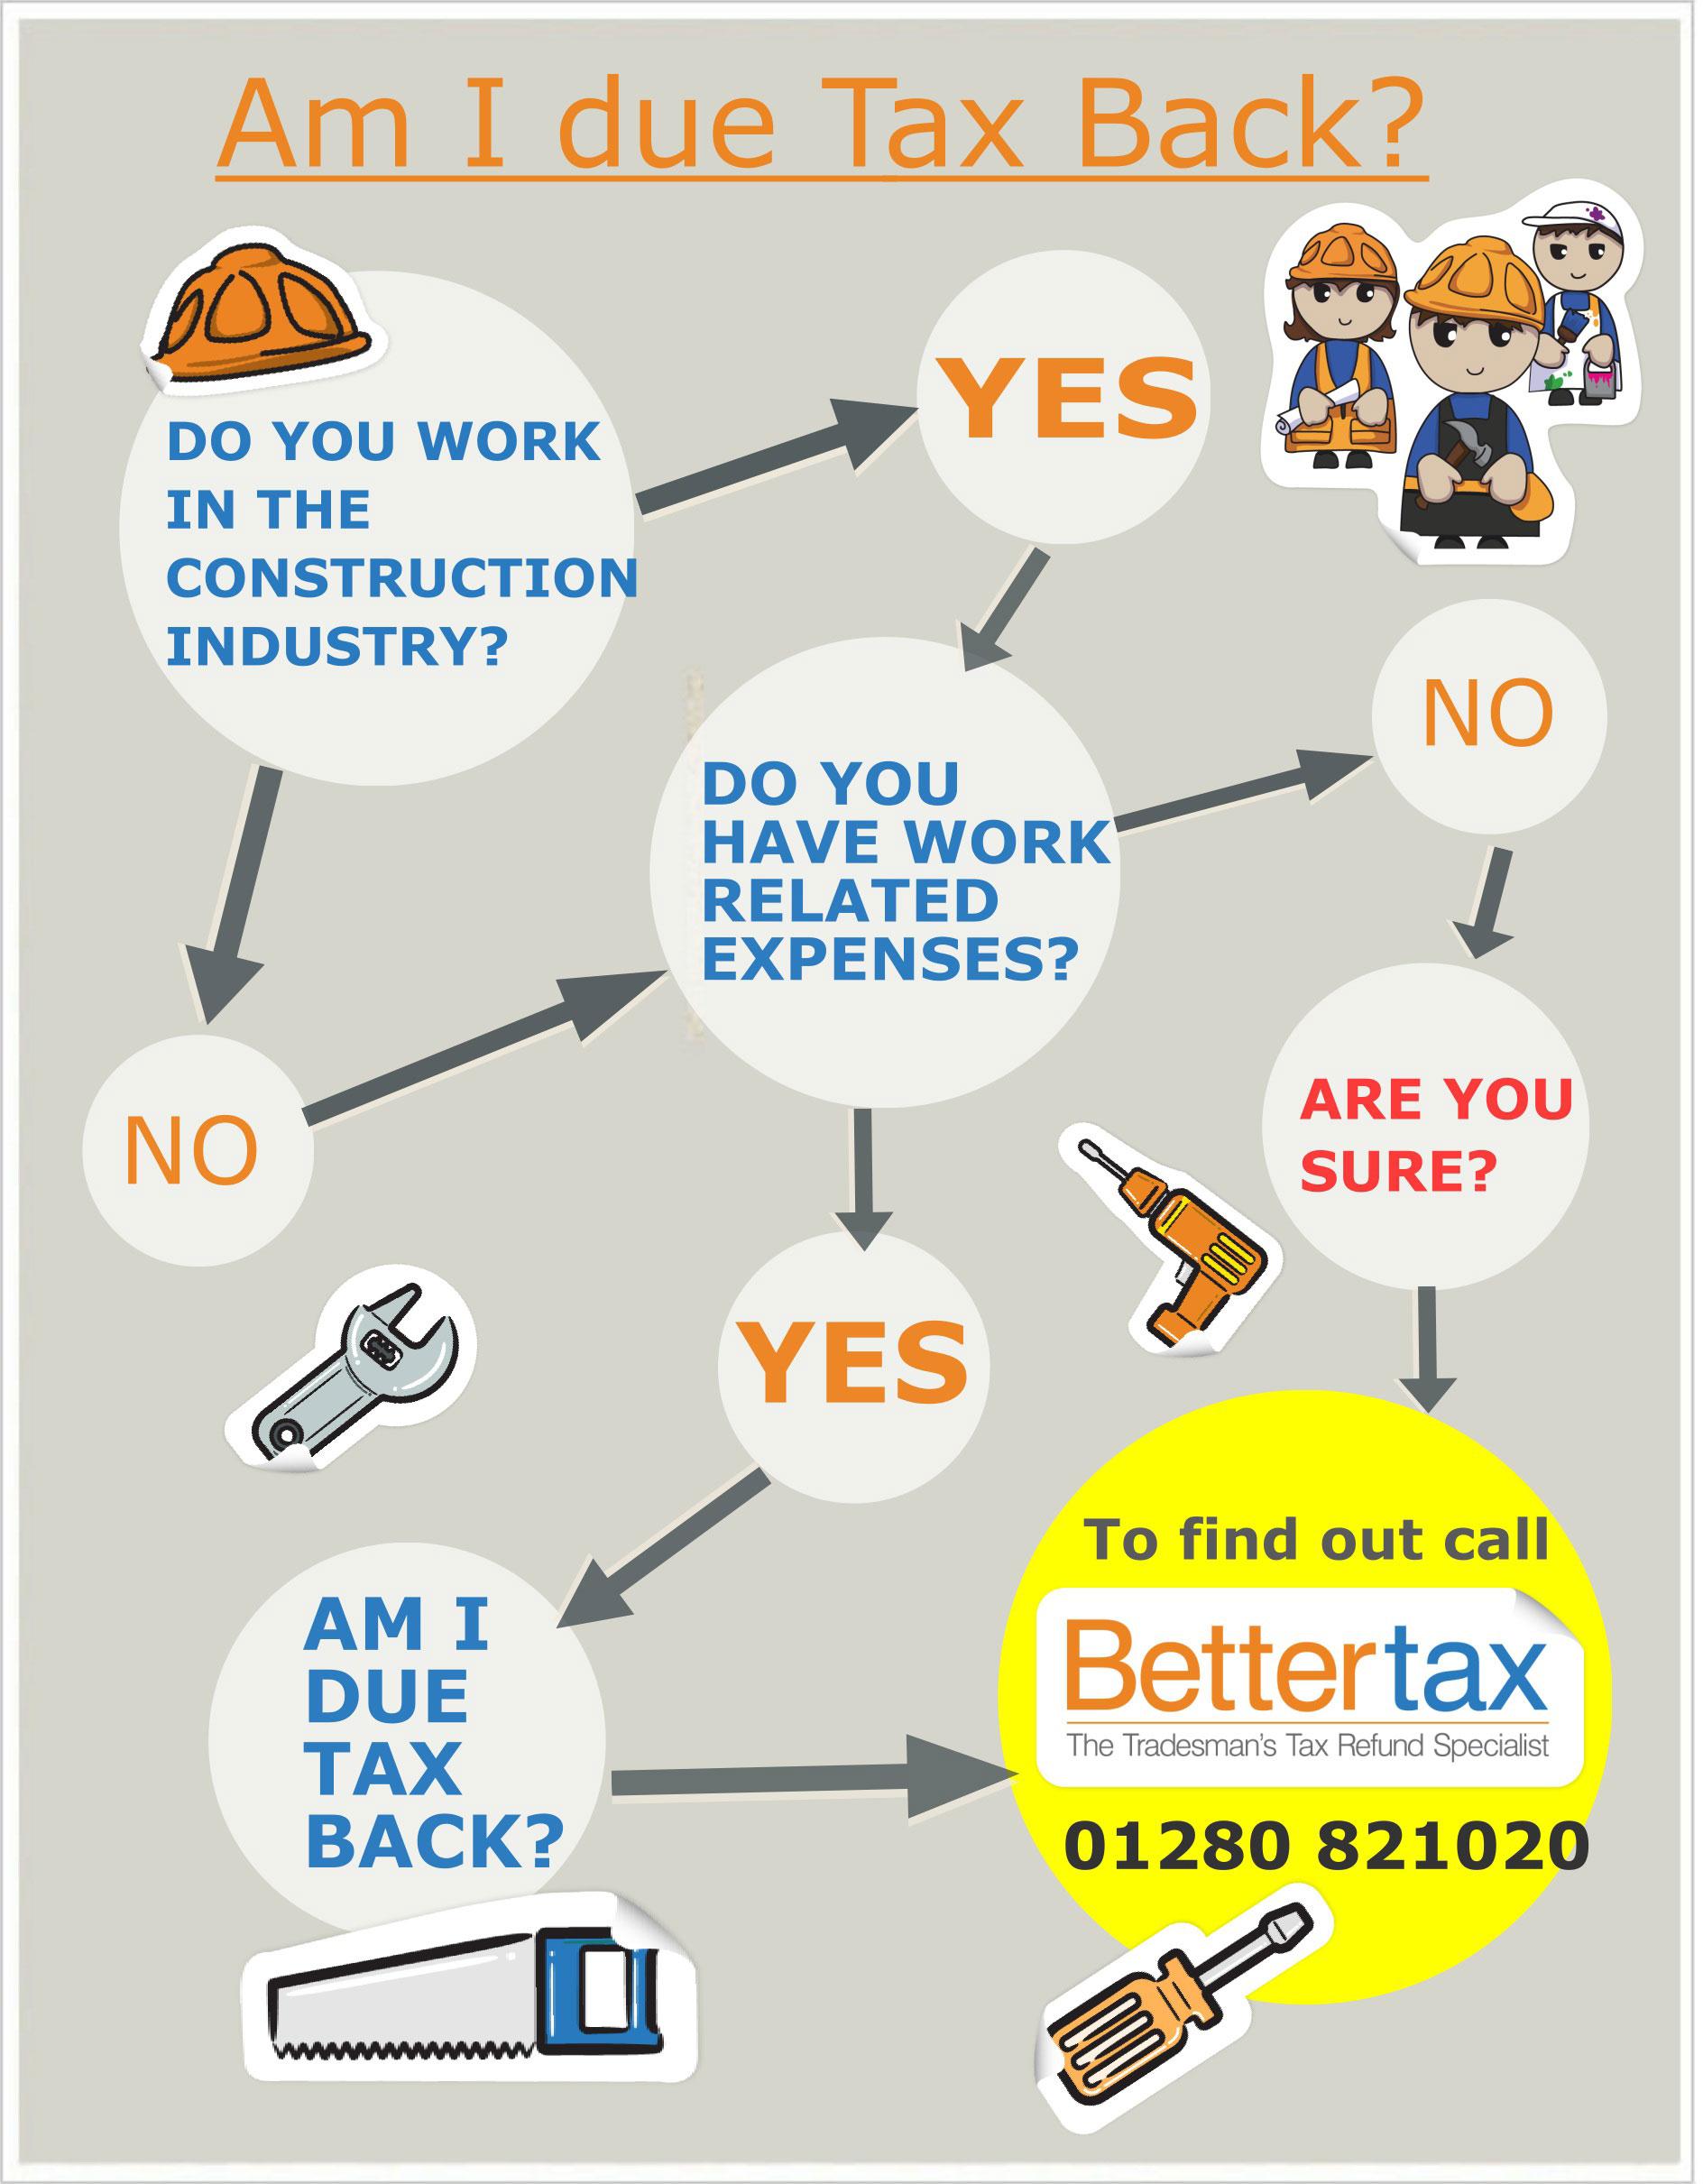 taxback-infographic-bettertax